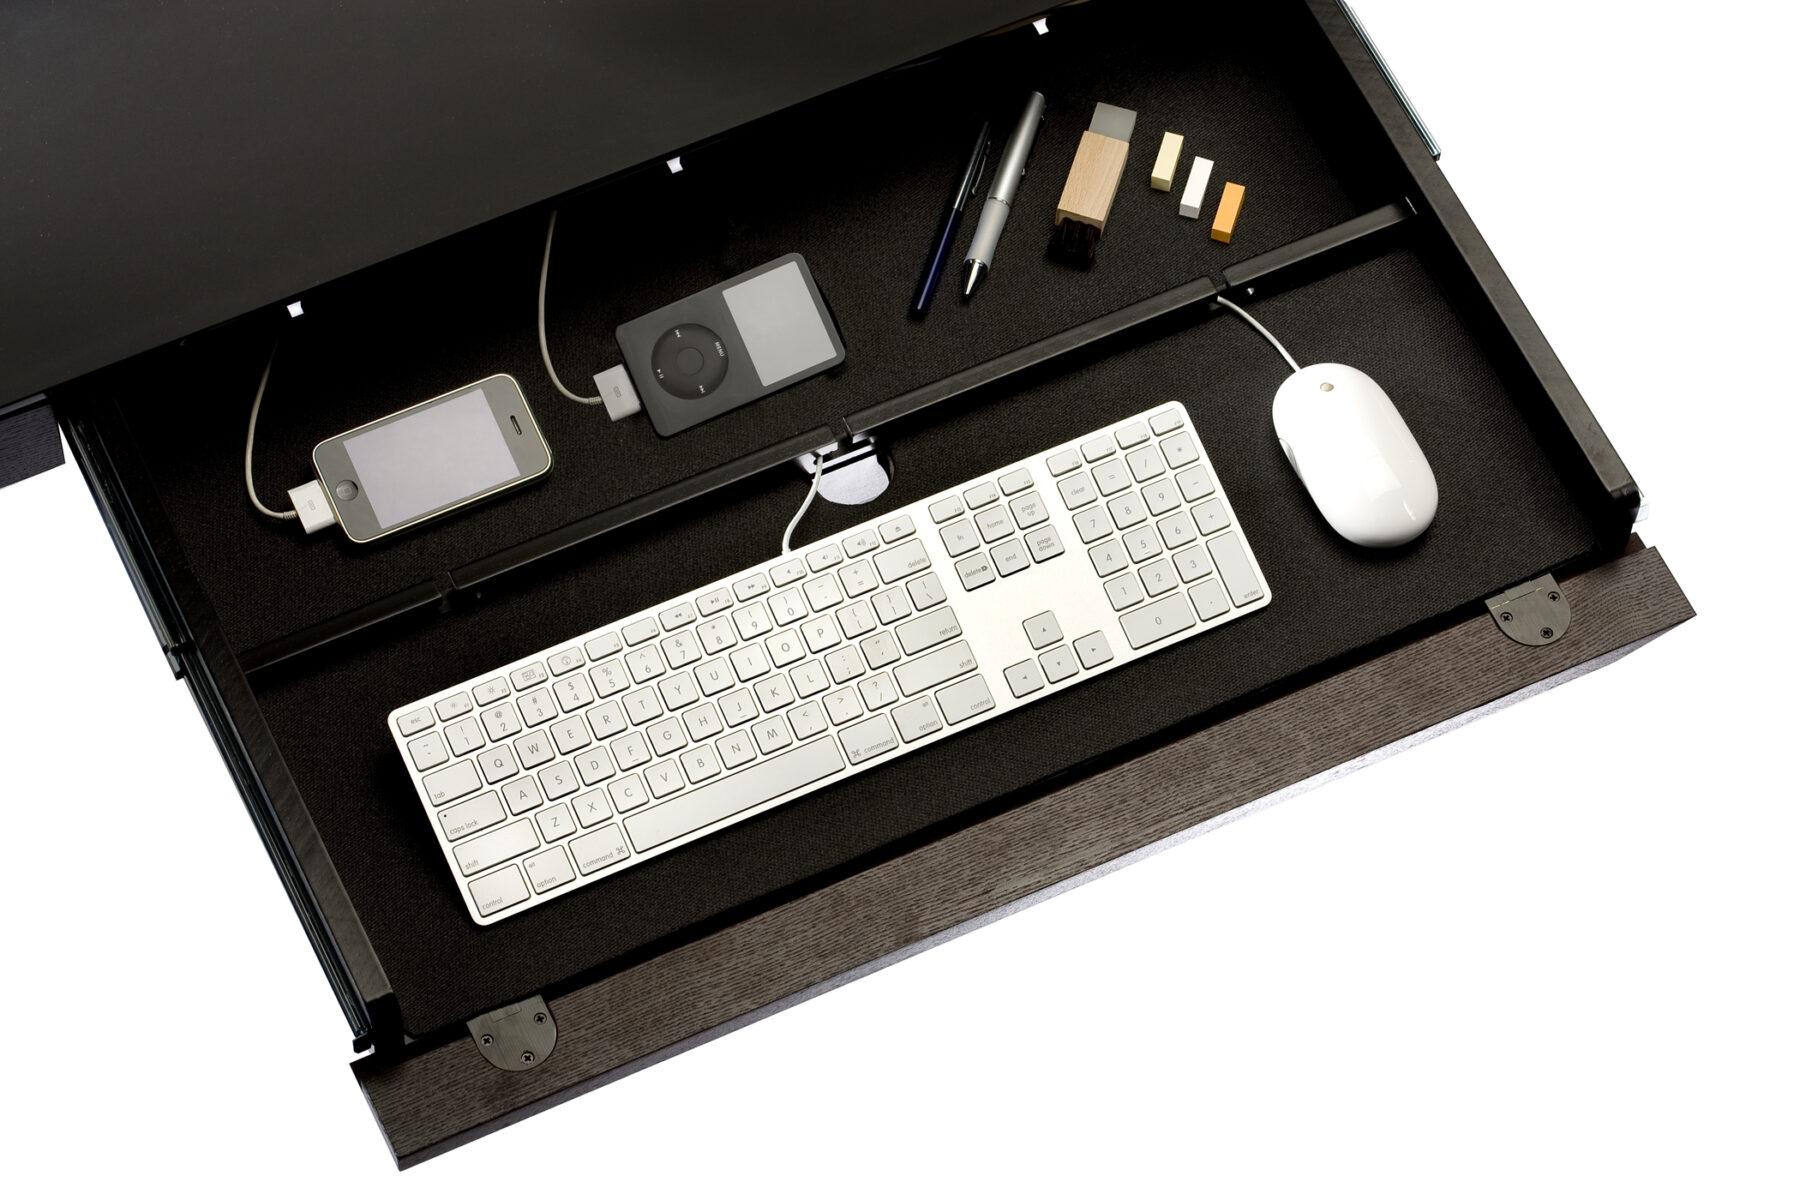 sequel-6001-keyboard-drawer-detail-1